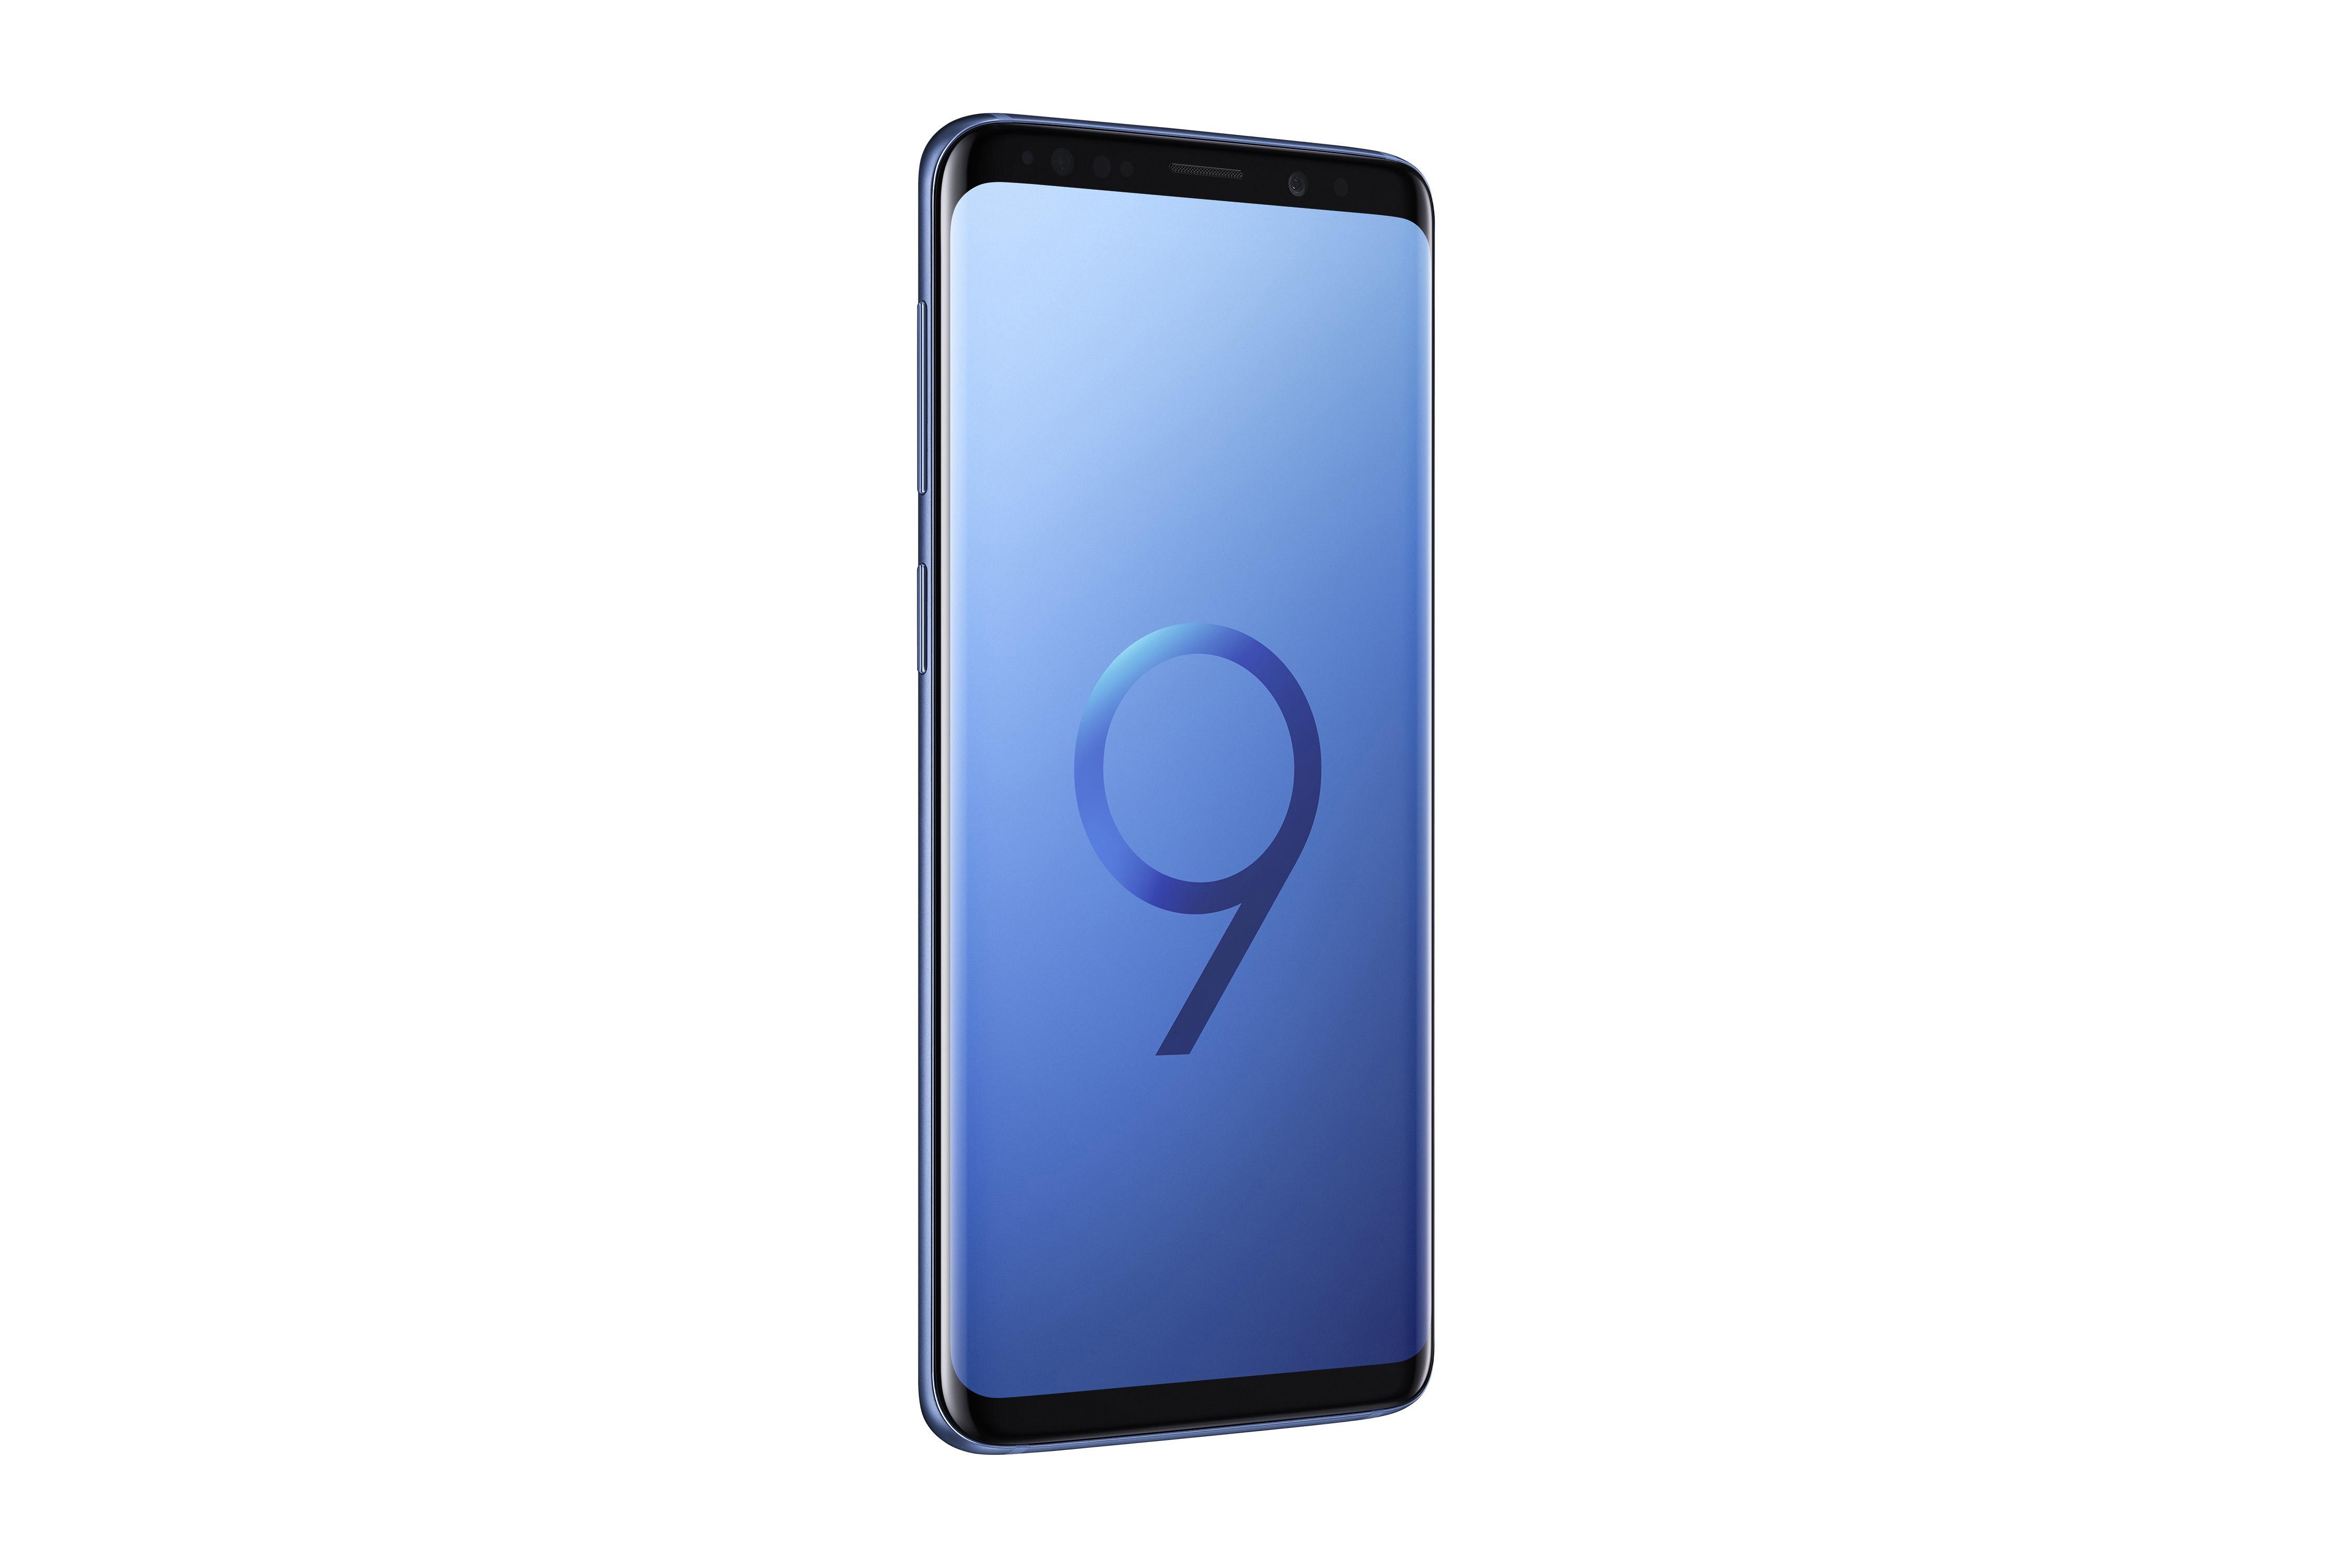 galaxy s9 blue 1